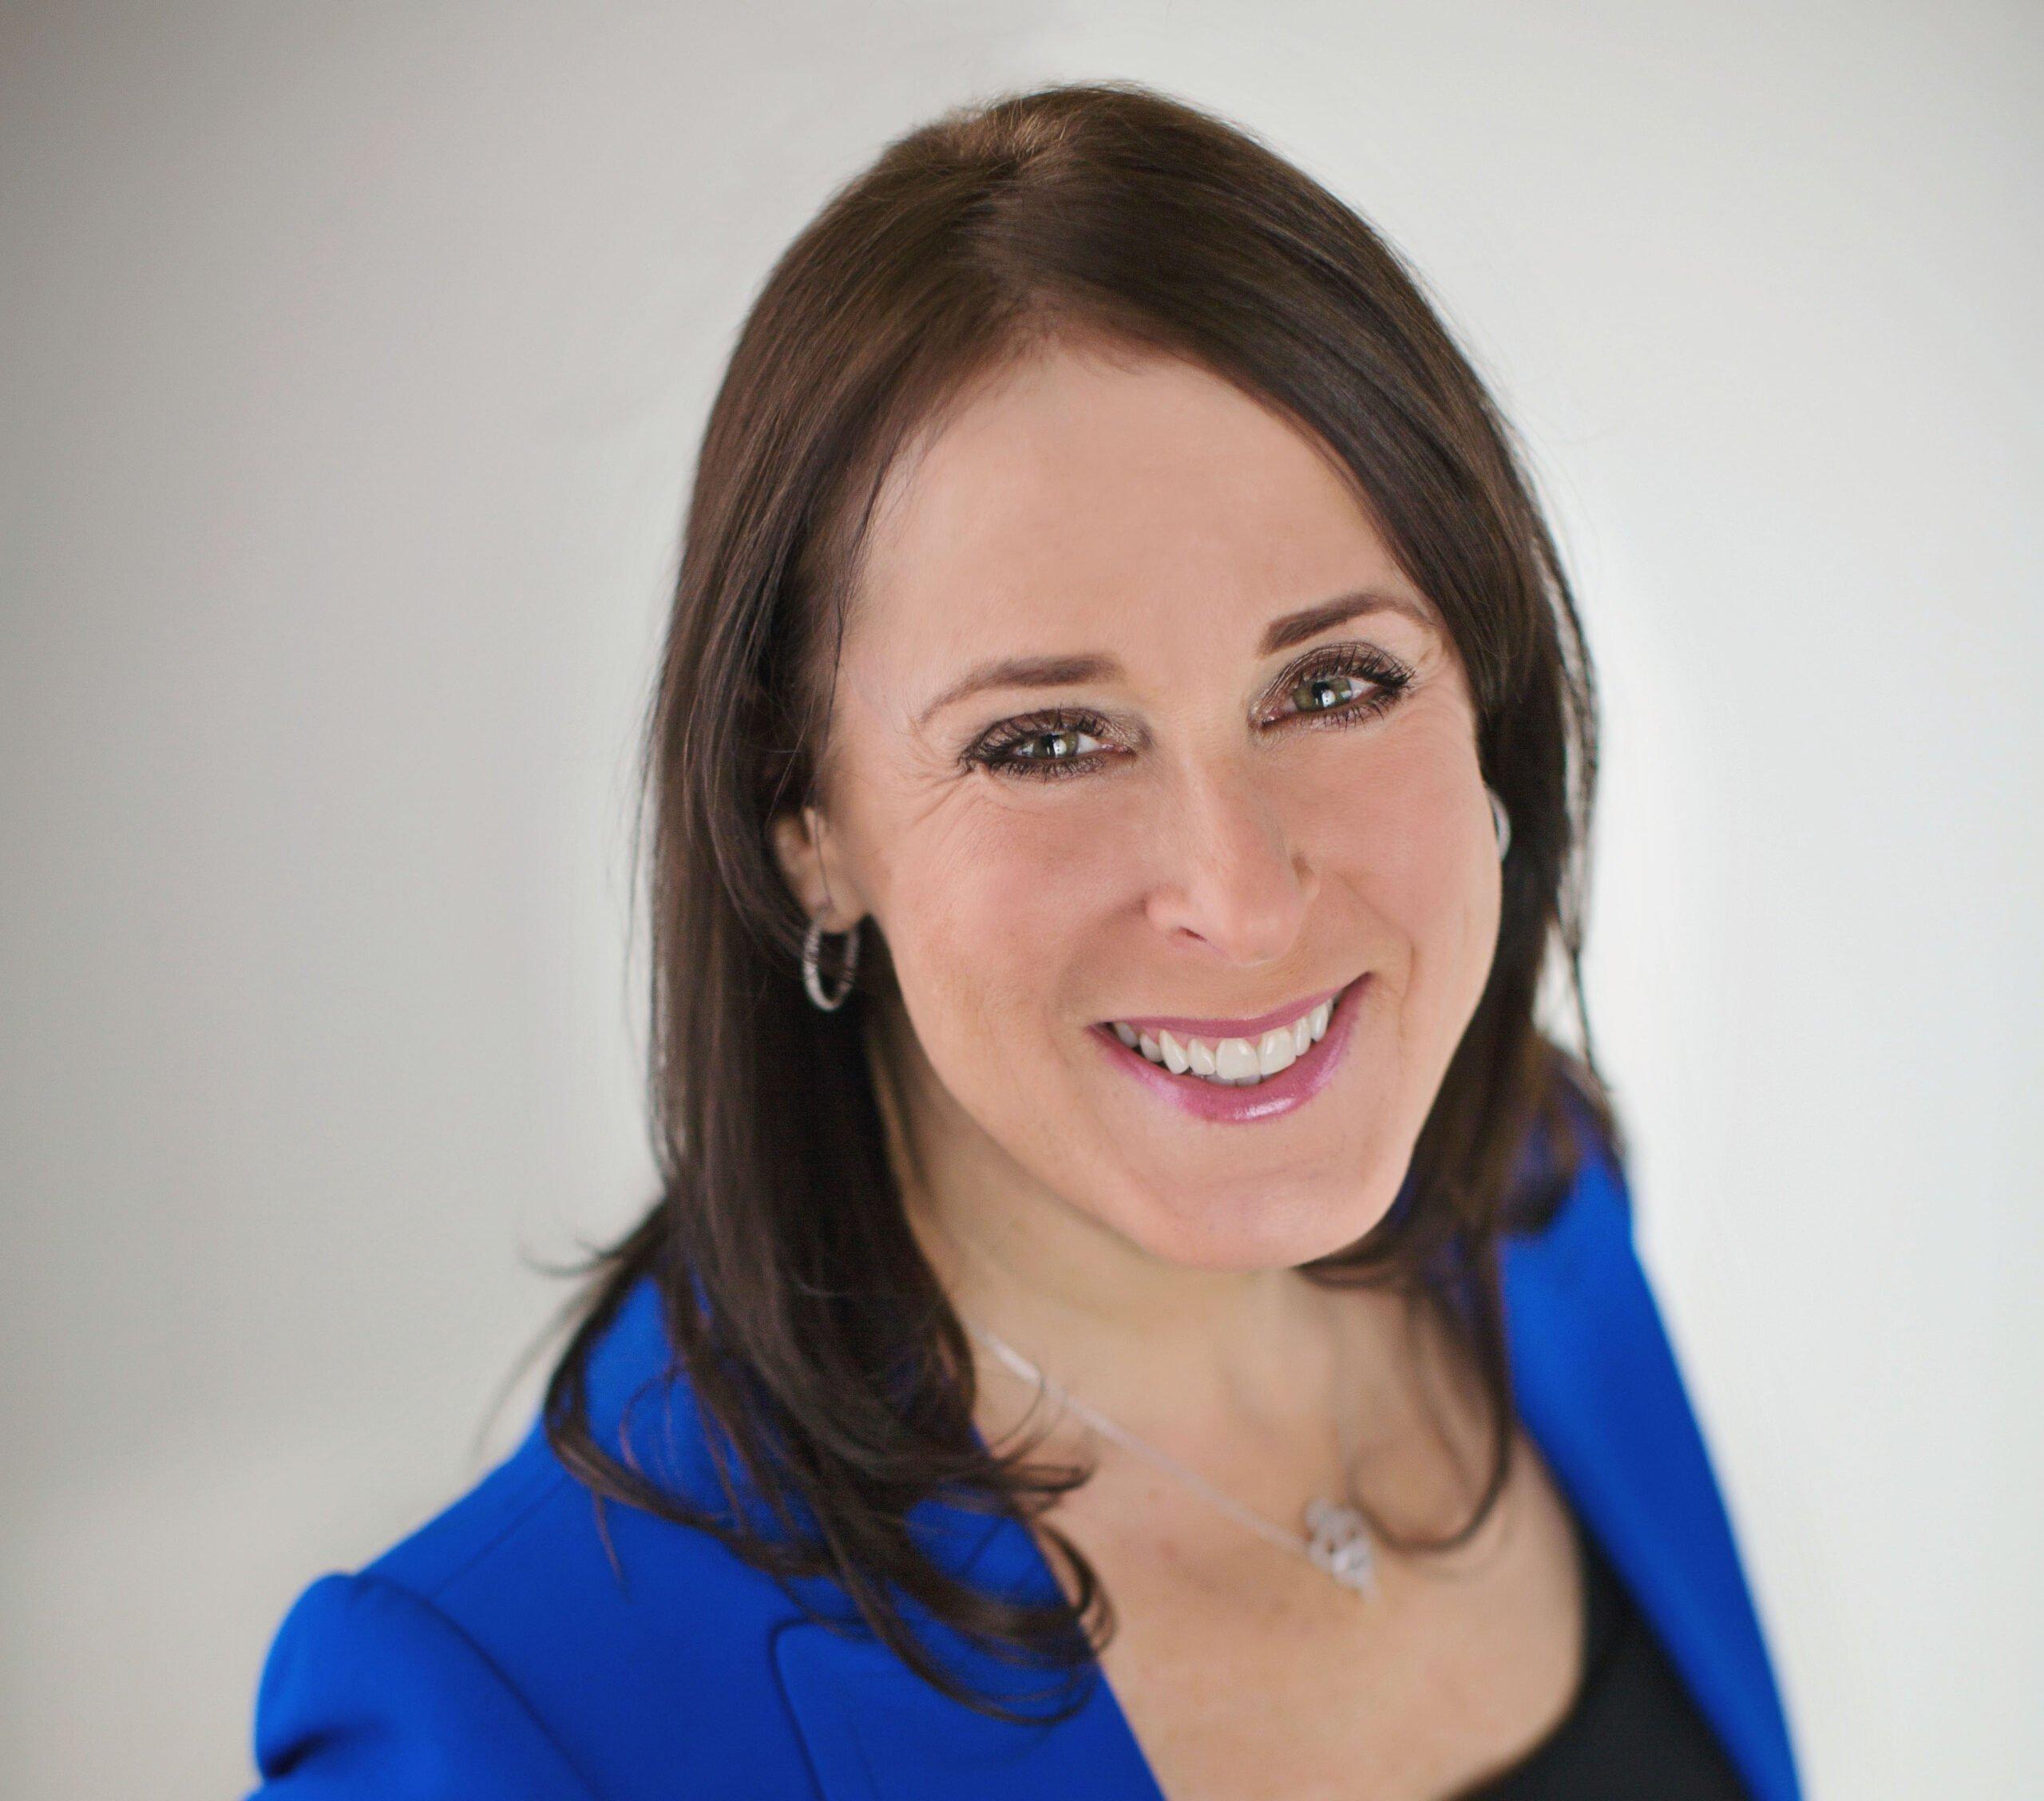 Merit Scholarship Expert Nancy Paul Presents the Scholarship Hunt & Pizza Party via Zoom on Feb. 21